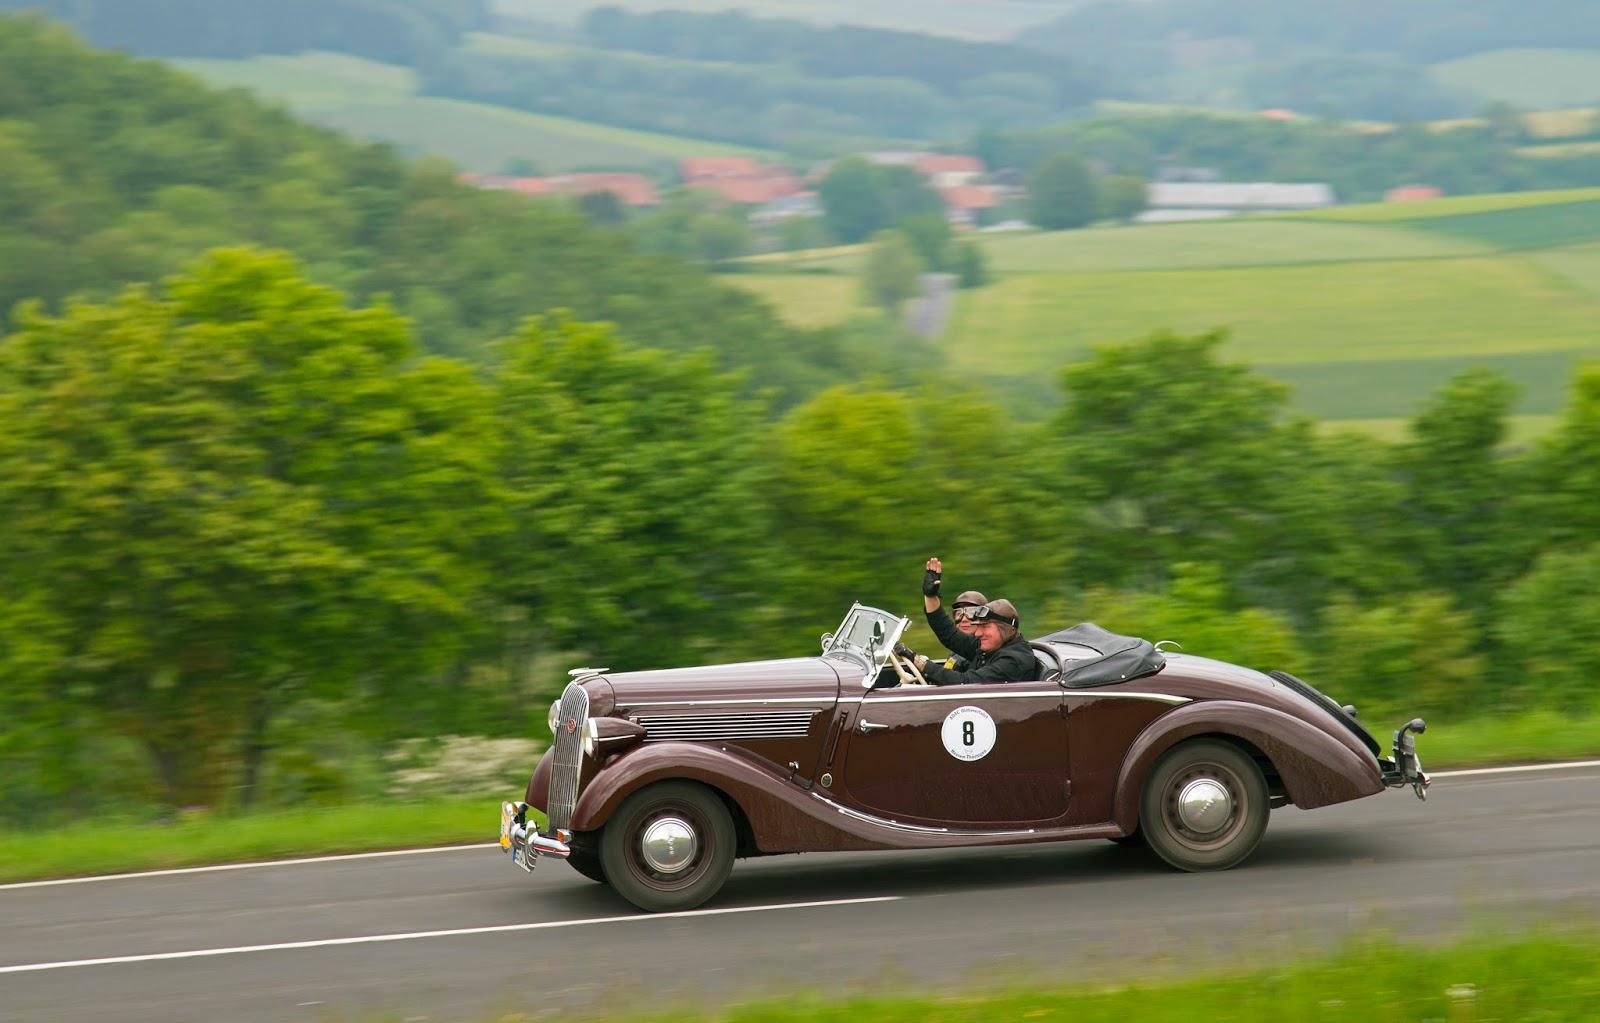 Opel Rallye Hessen Thueringen 2016 Super 6 301179 Ταξίδι στο χρόνο μέσα από την ιστορία 100 χρόνων των Opel Cabrio cabrio, Opel, Opel 8/25 hp, Opel Cascada, Opel Olympia, Opel Record